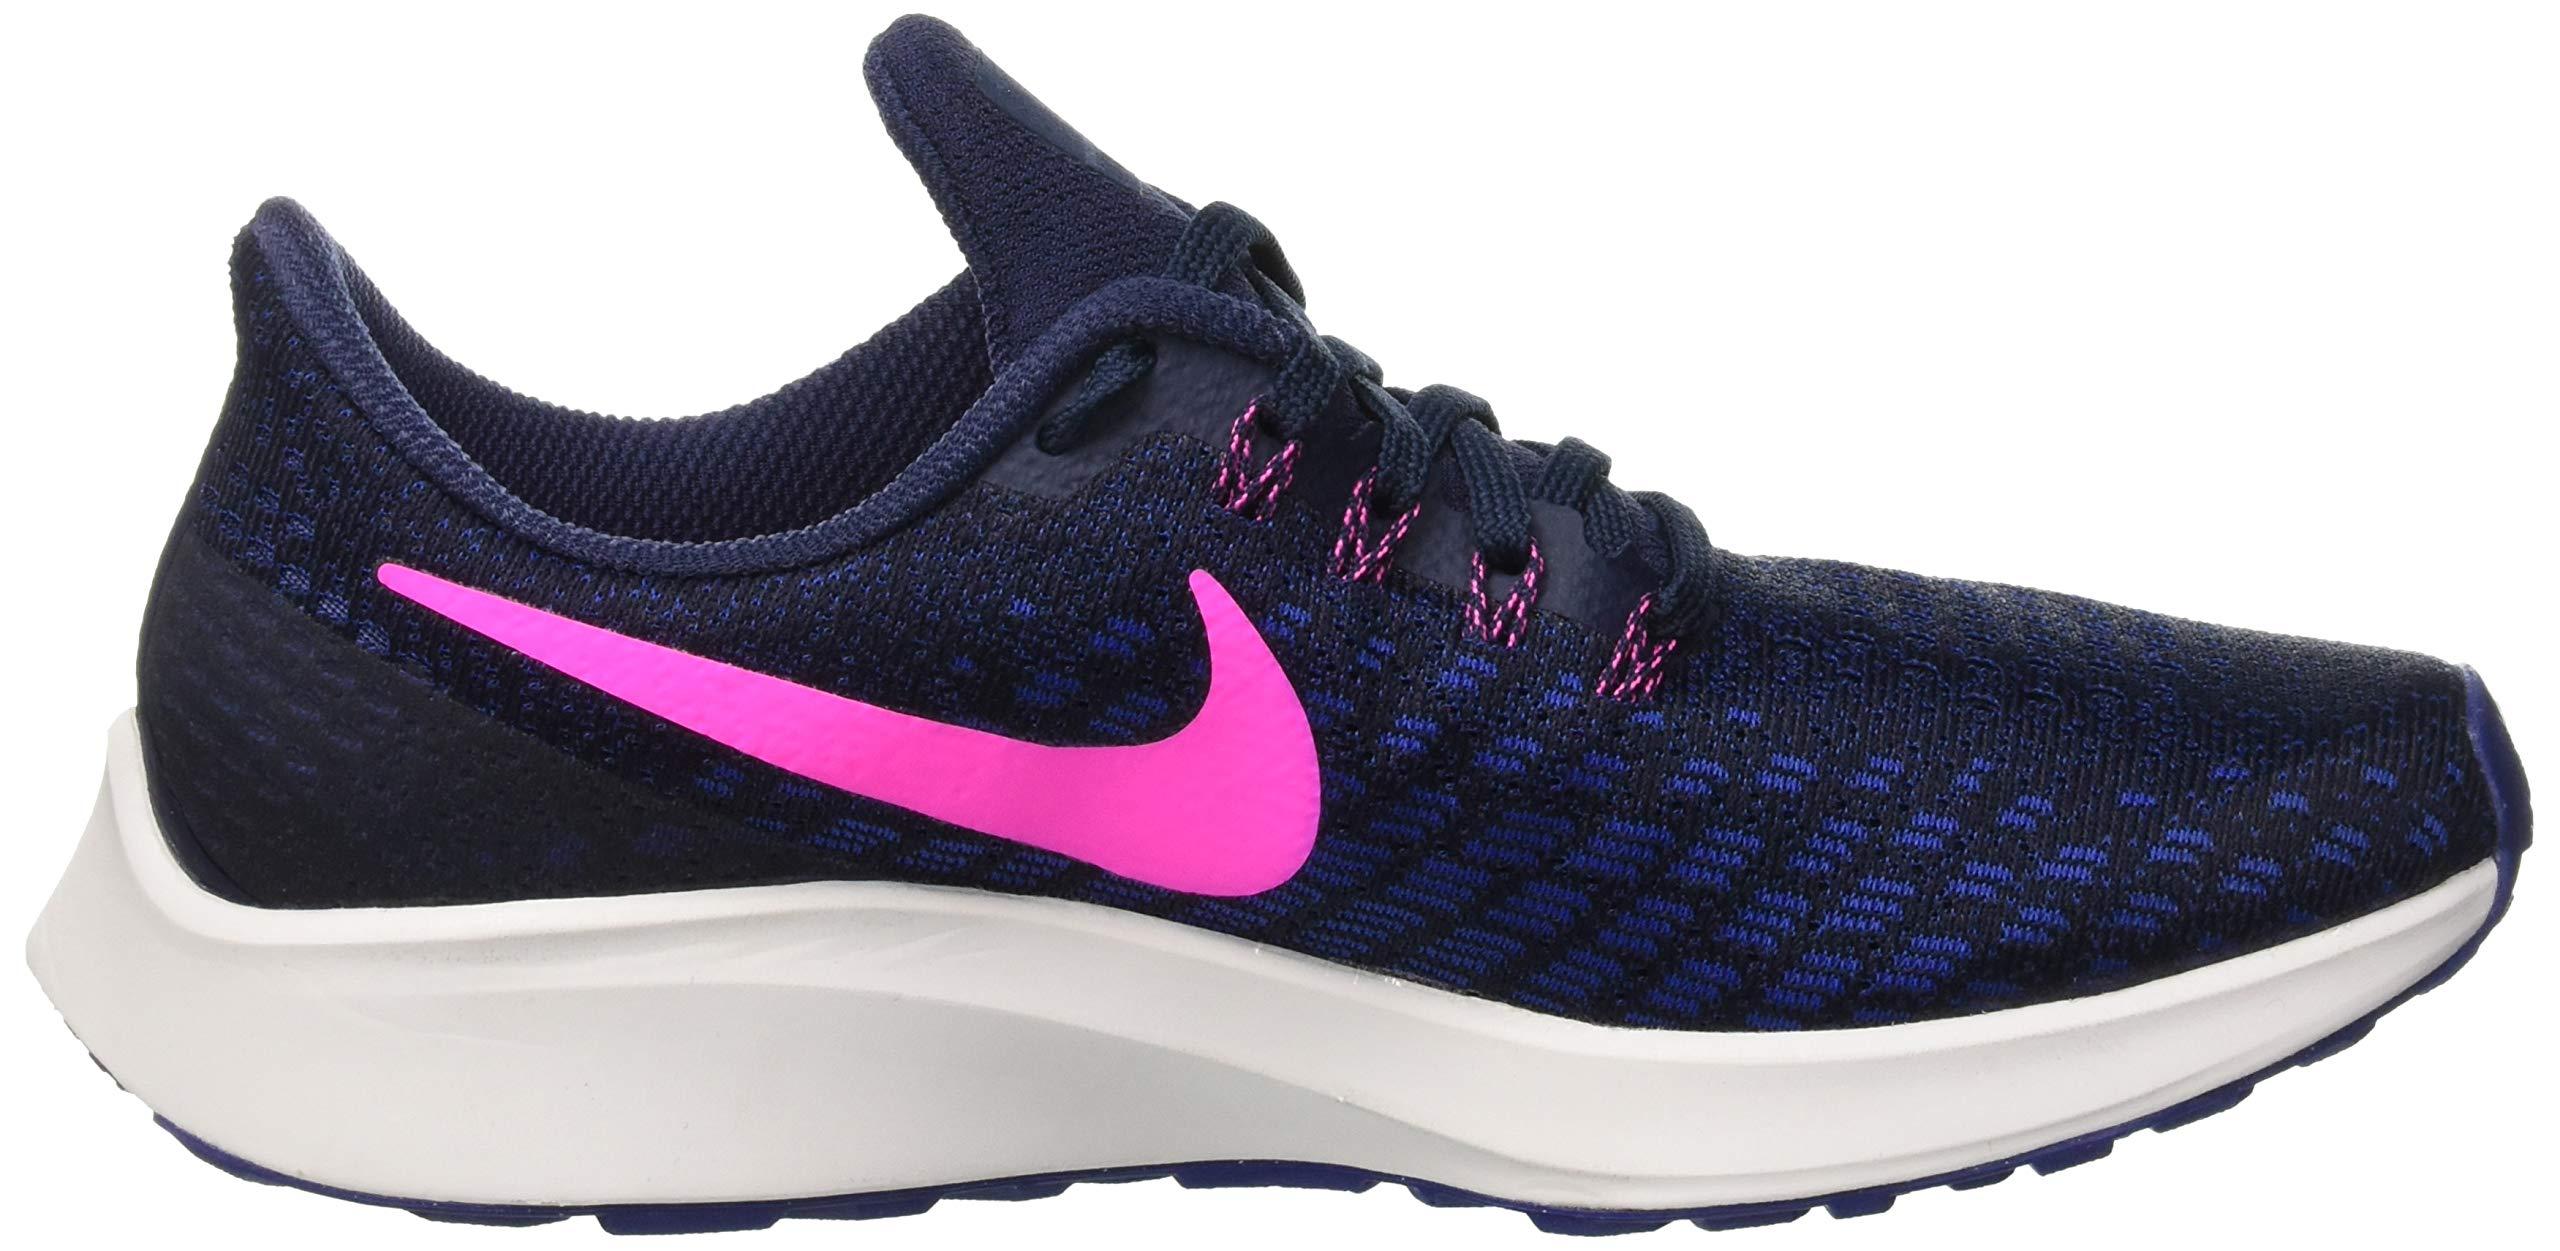 Nike Air Zoom Pegasus 35, Women's Running, Multicolored (Obsidian/Pink Blast/Deep Royal Blue 401), 4 UK (EU) by Nike (Image #6)